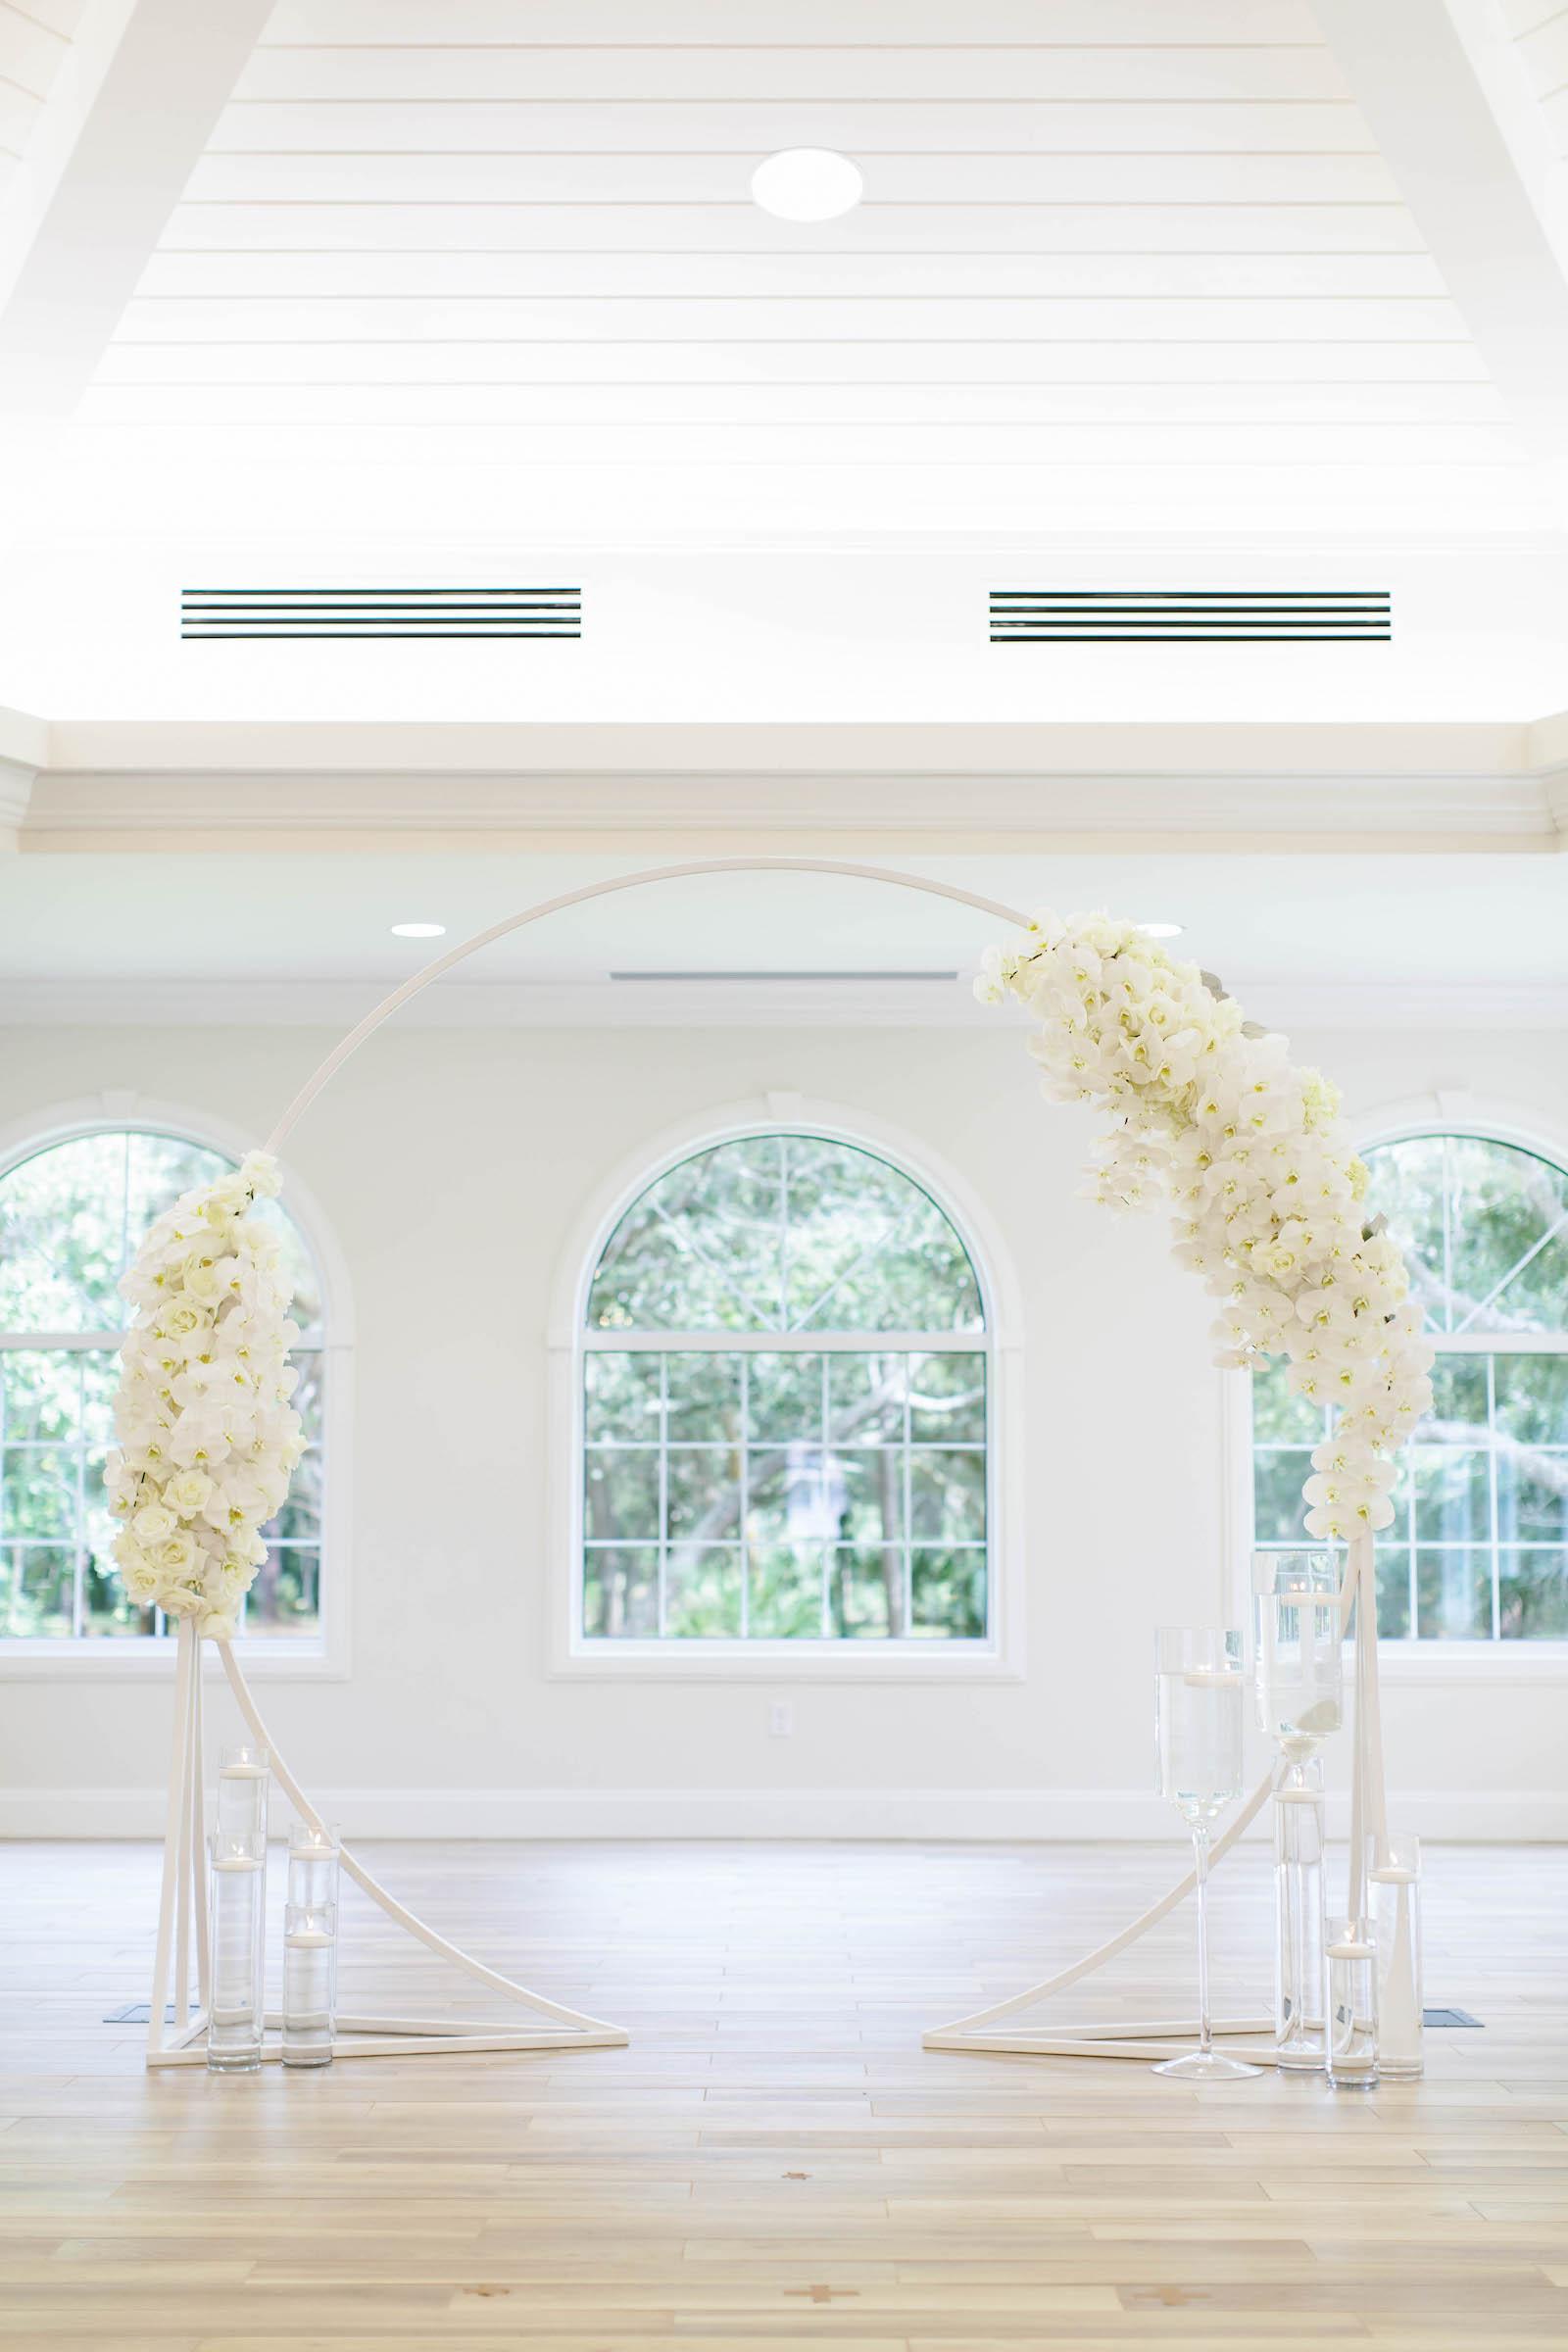 Classic Church Wedding Ceremony Decor, Circular Arch with White Floral Arrangements | Tampa Bay Wedding Planner Parties A'la Carte | Safety Harbor Wedding Venue Harborside Chapel